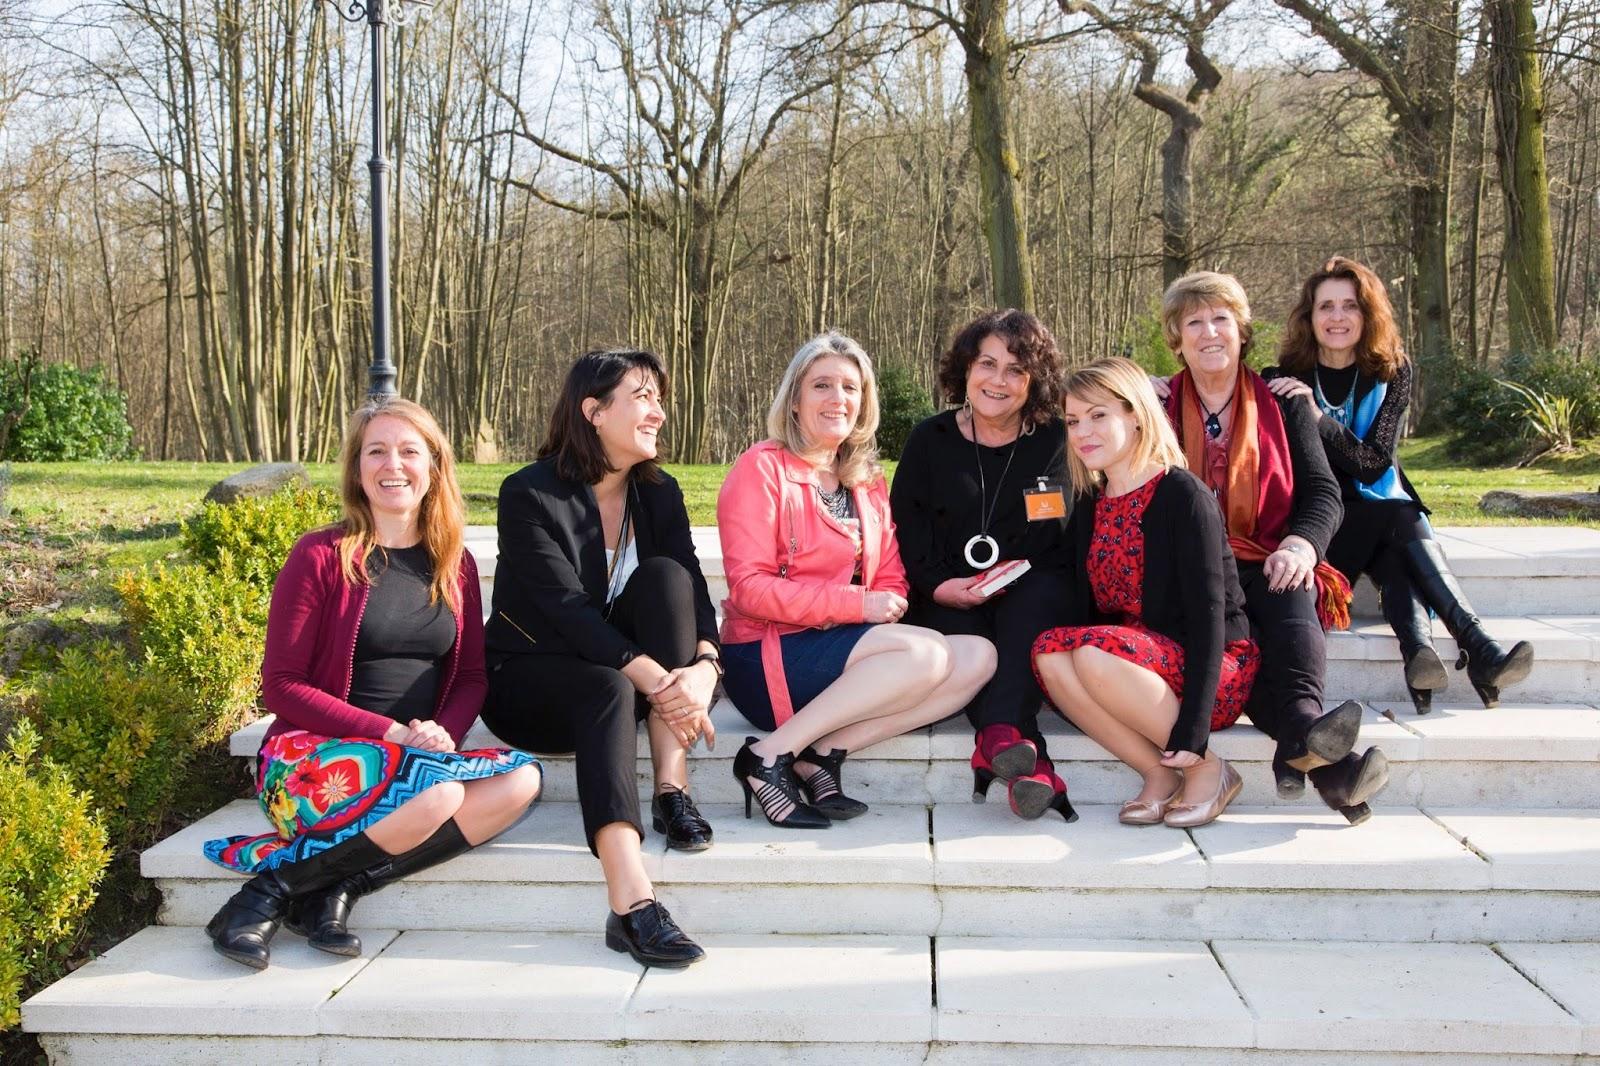 Femmes cherche femmes belgique